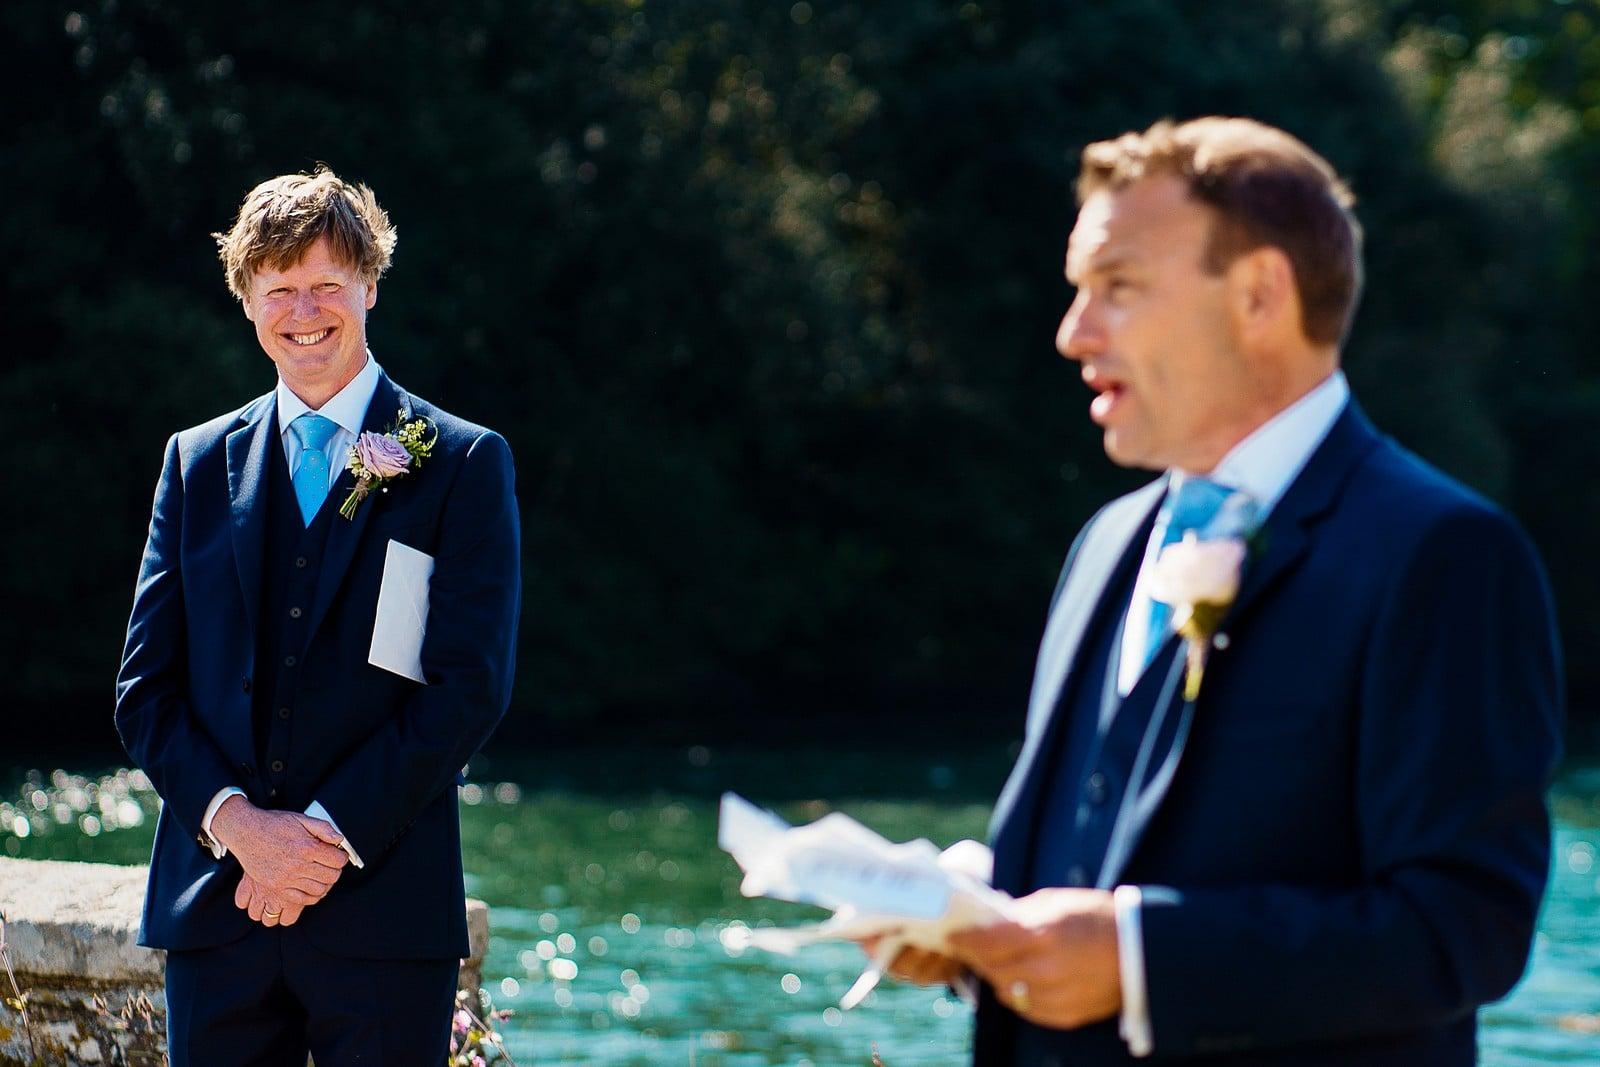 best of 2019 - Place manor wedding photographer 011